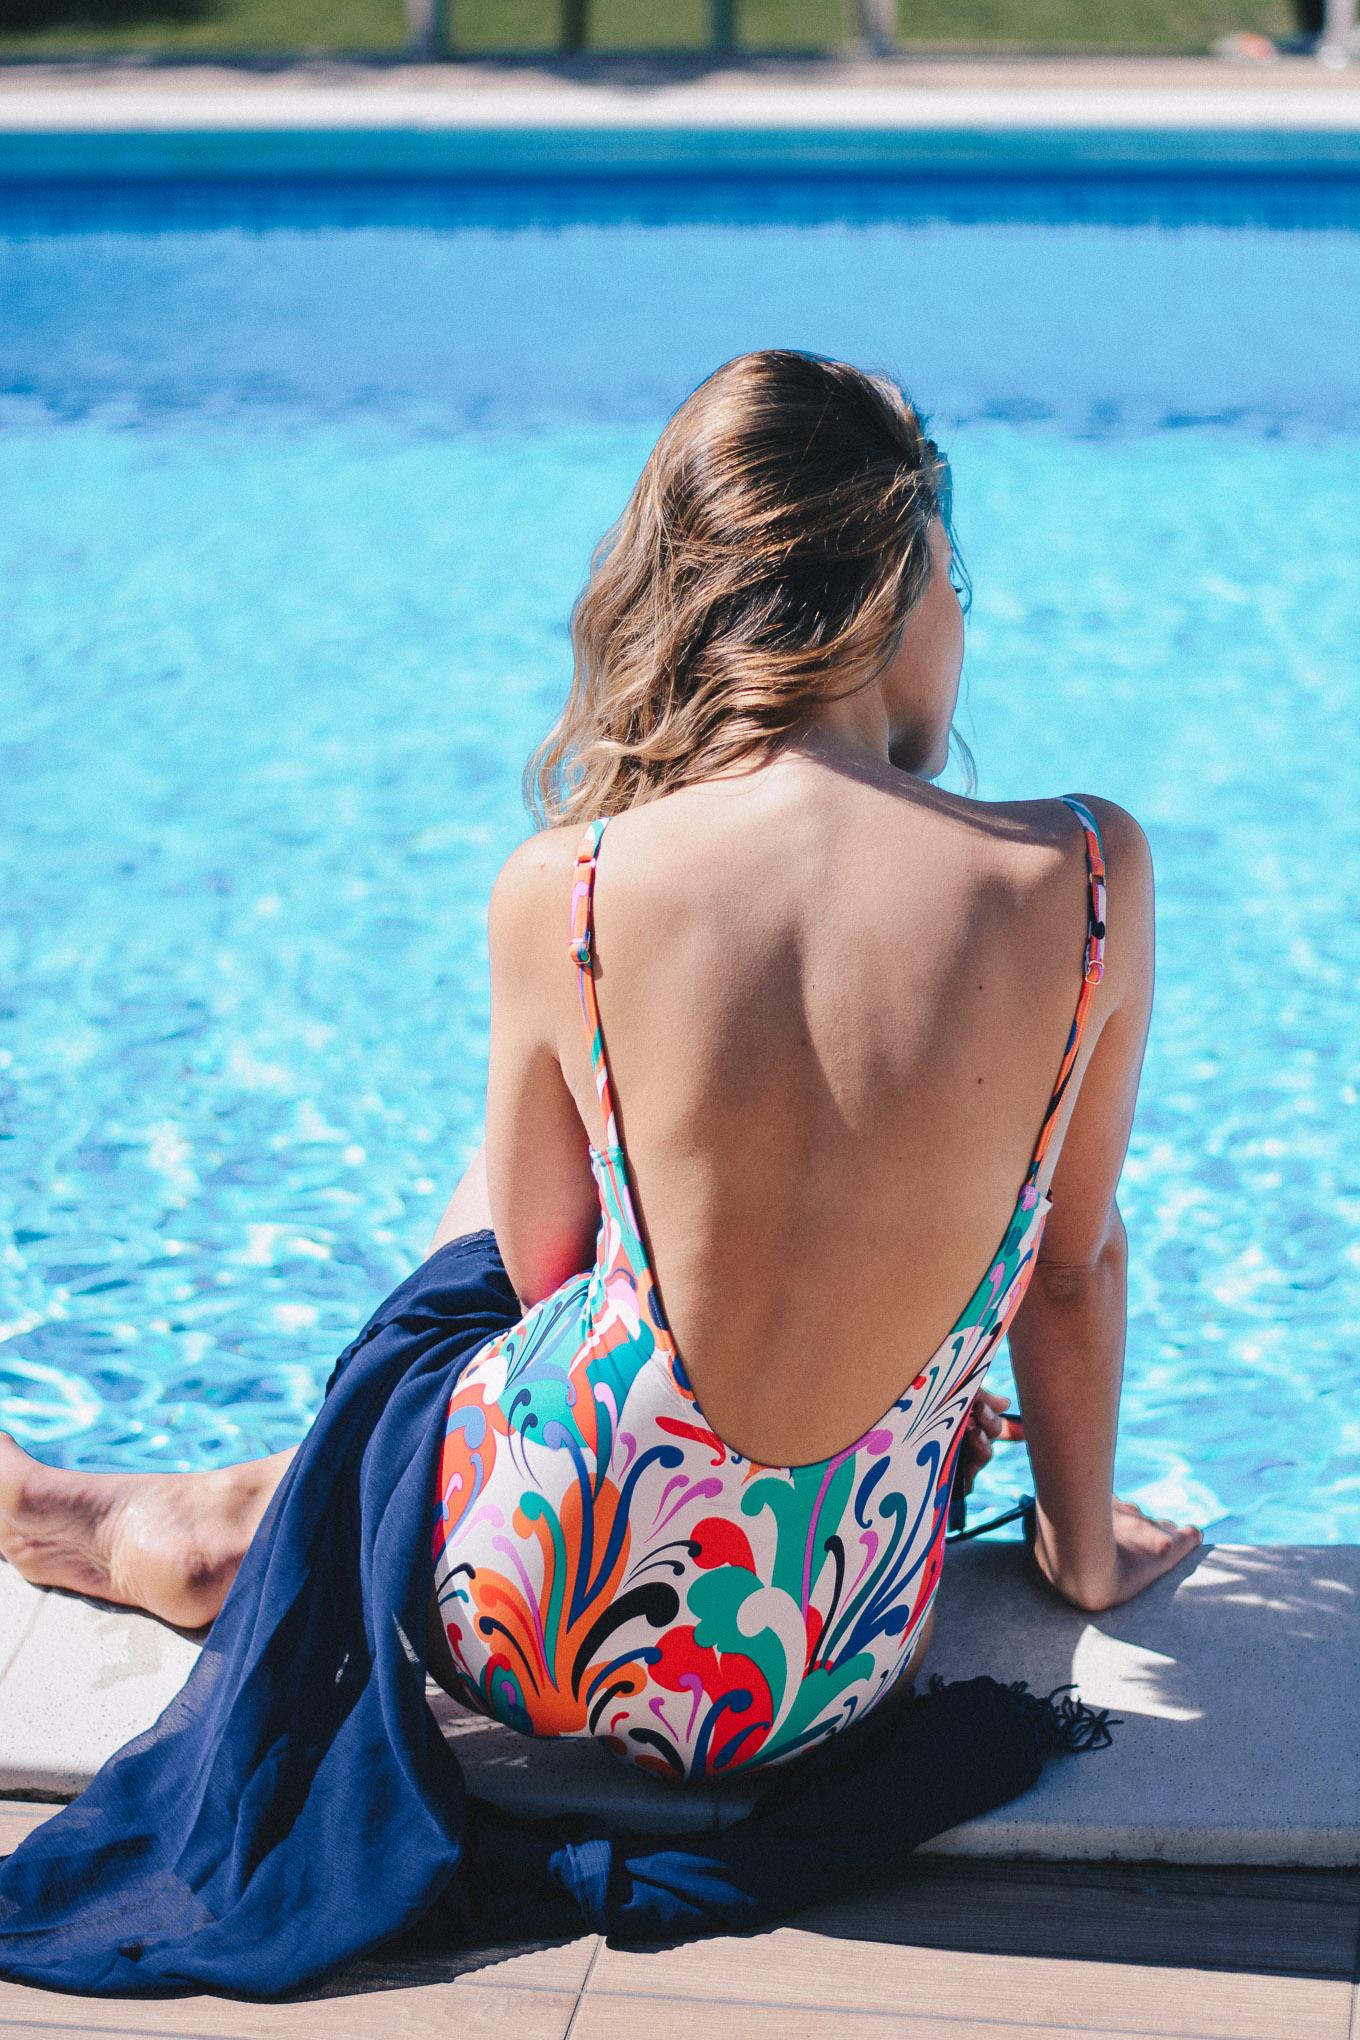 70s swimsuit inspired